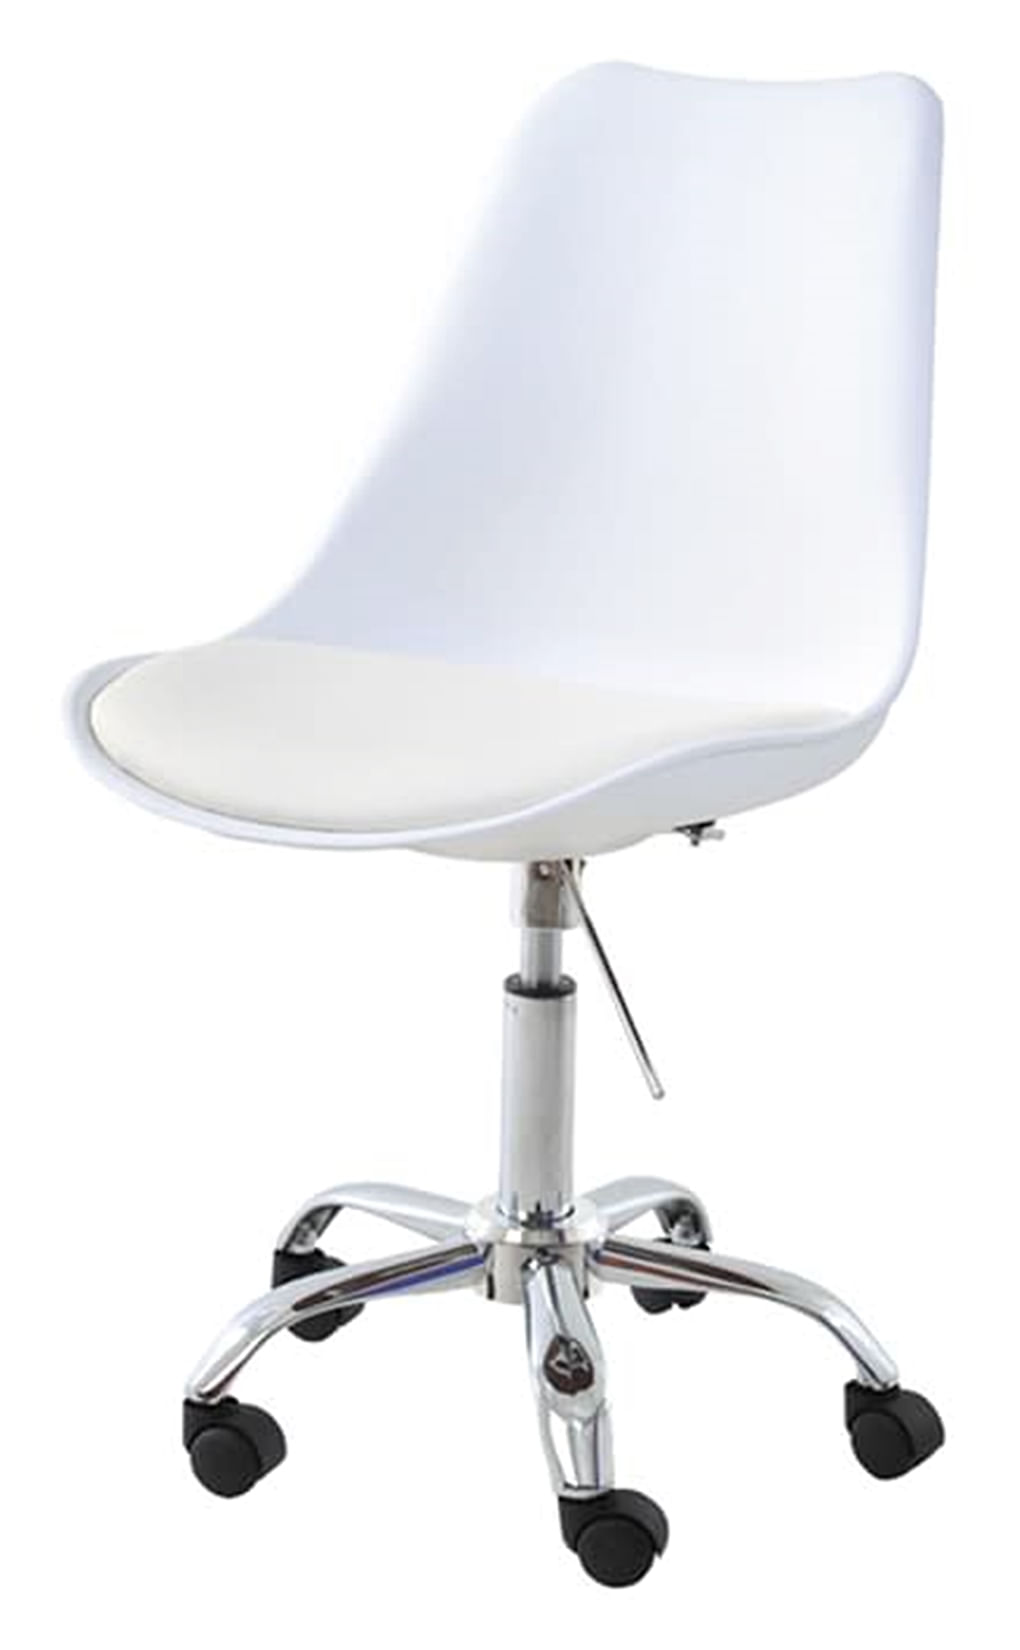 Cadeira Saarinen Assento em Polipropileno cor Branco com Base Cromada - 45063